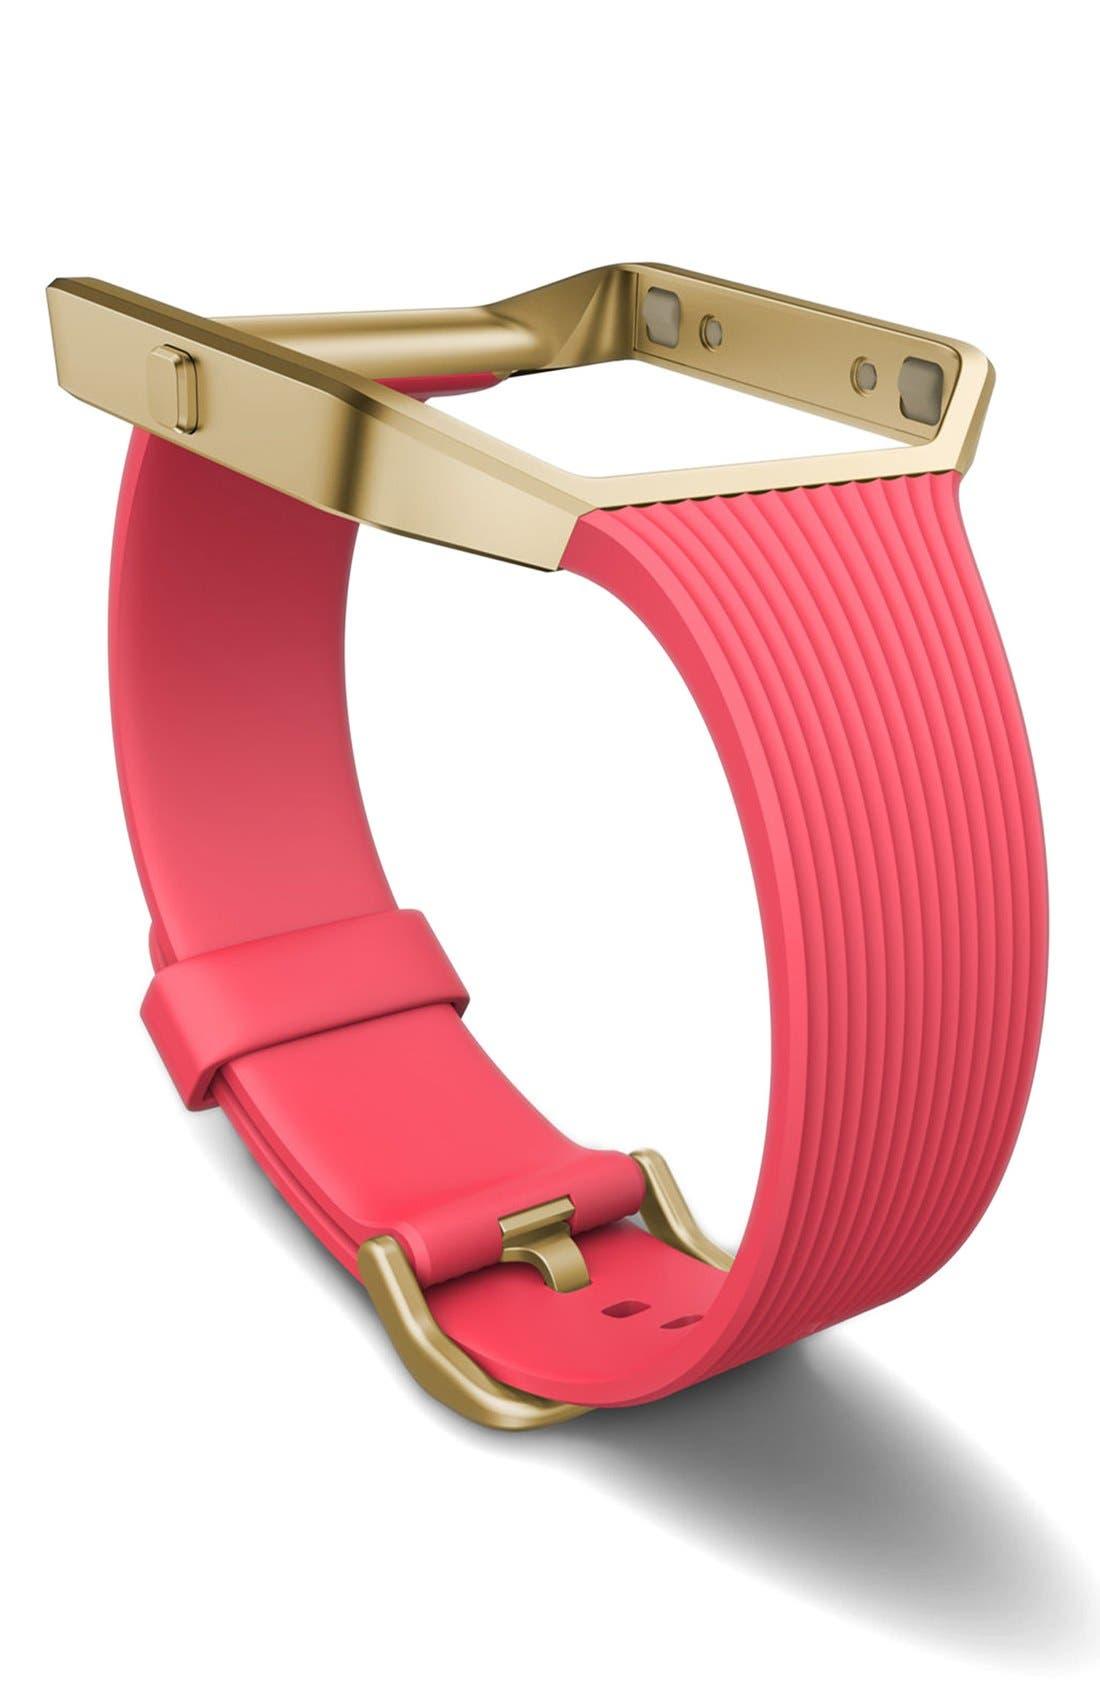 Main Image - Fitbit 'Blaze' Slim Accessory Band & Frame